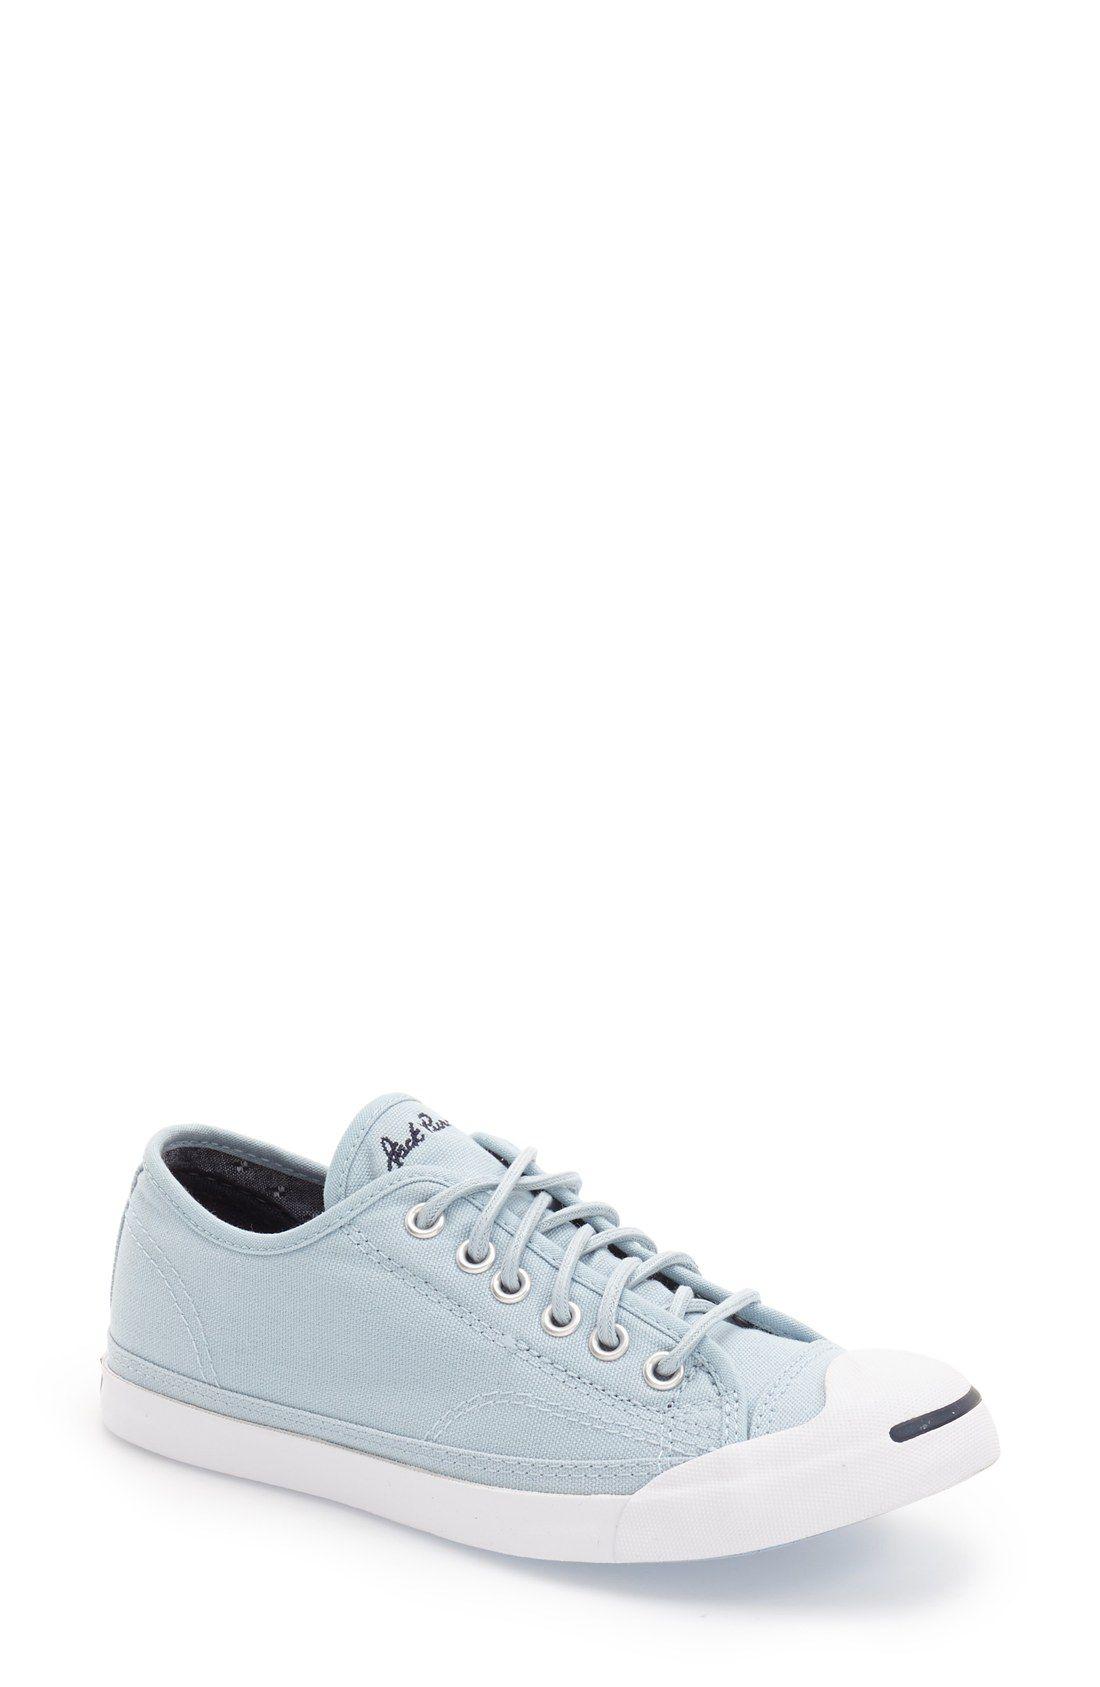 20dc88a022f4 Converse  Jack Purcell  Sneaker (Women)